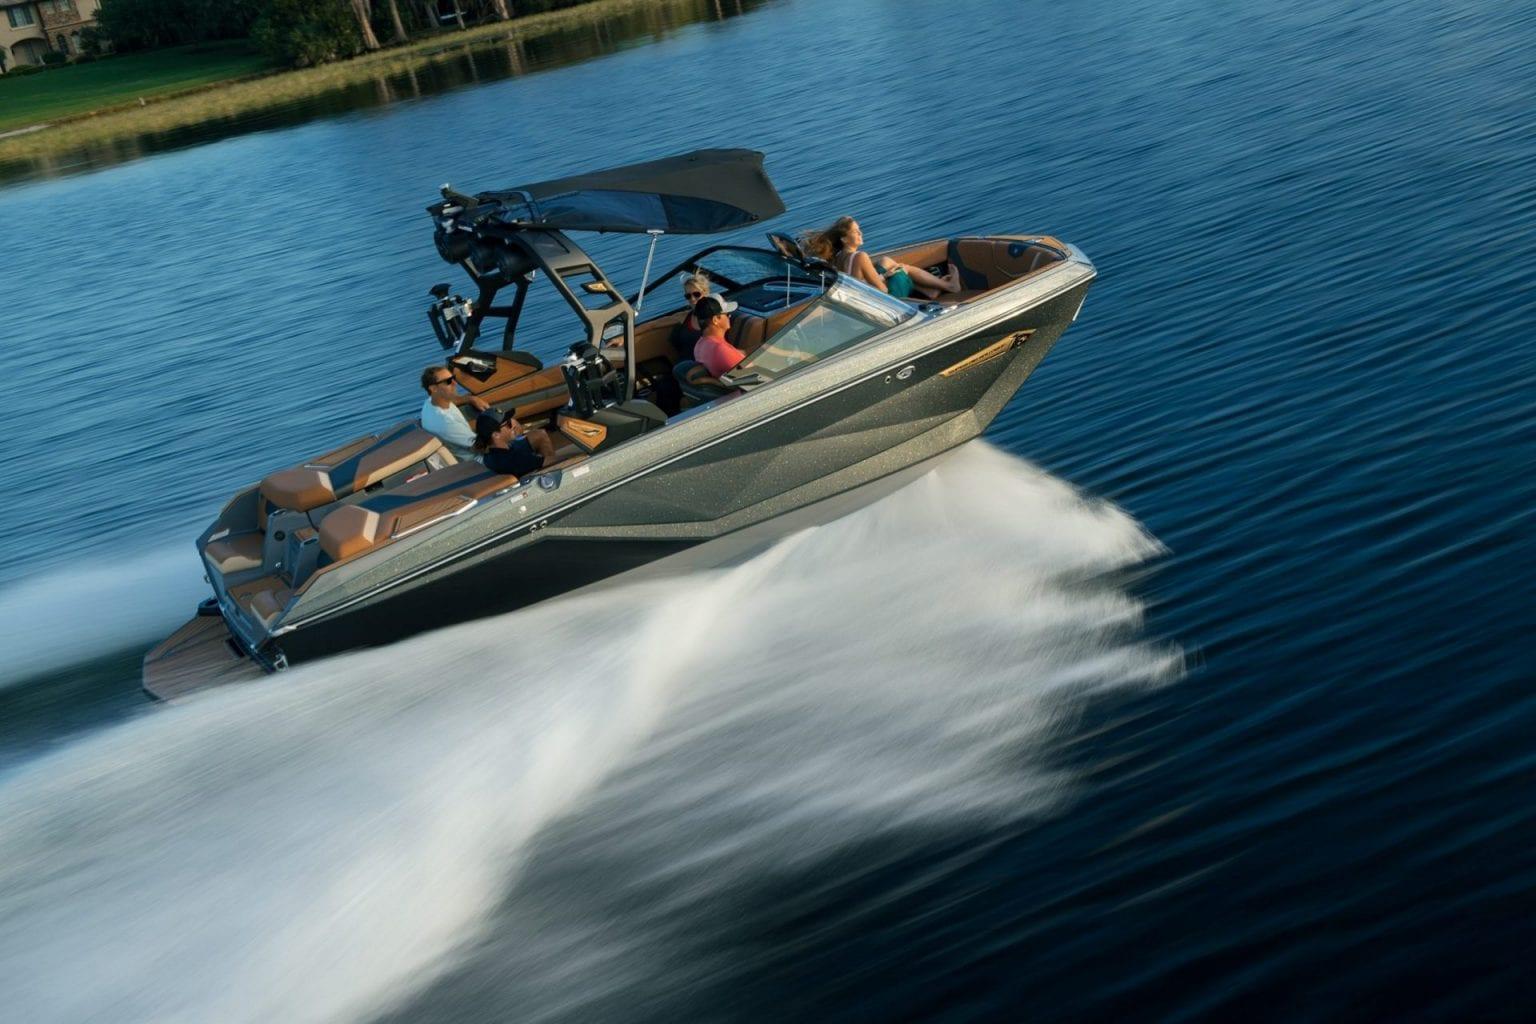 NAUTIQUE G21 - Stream Yachts